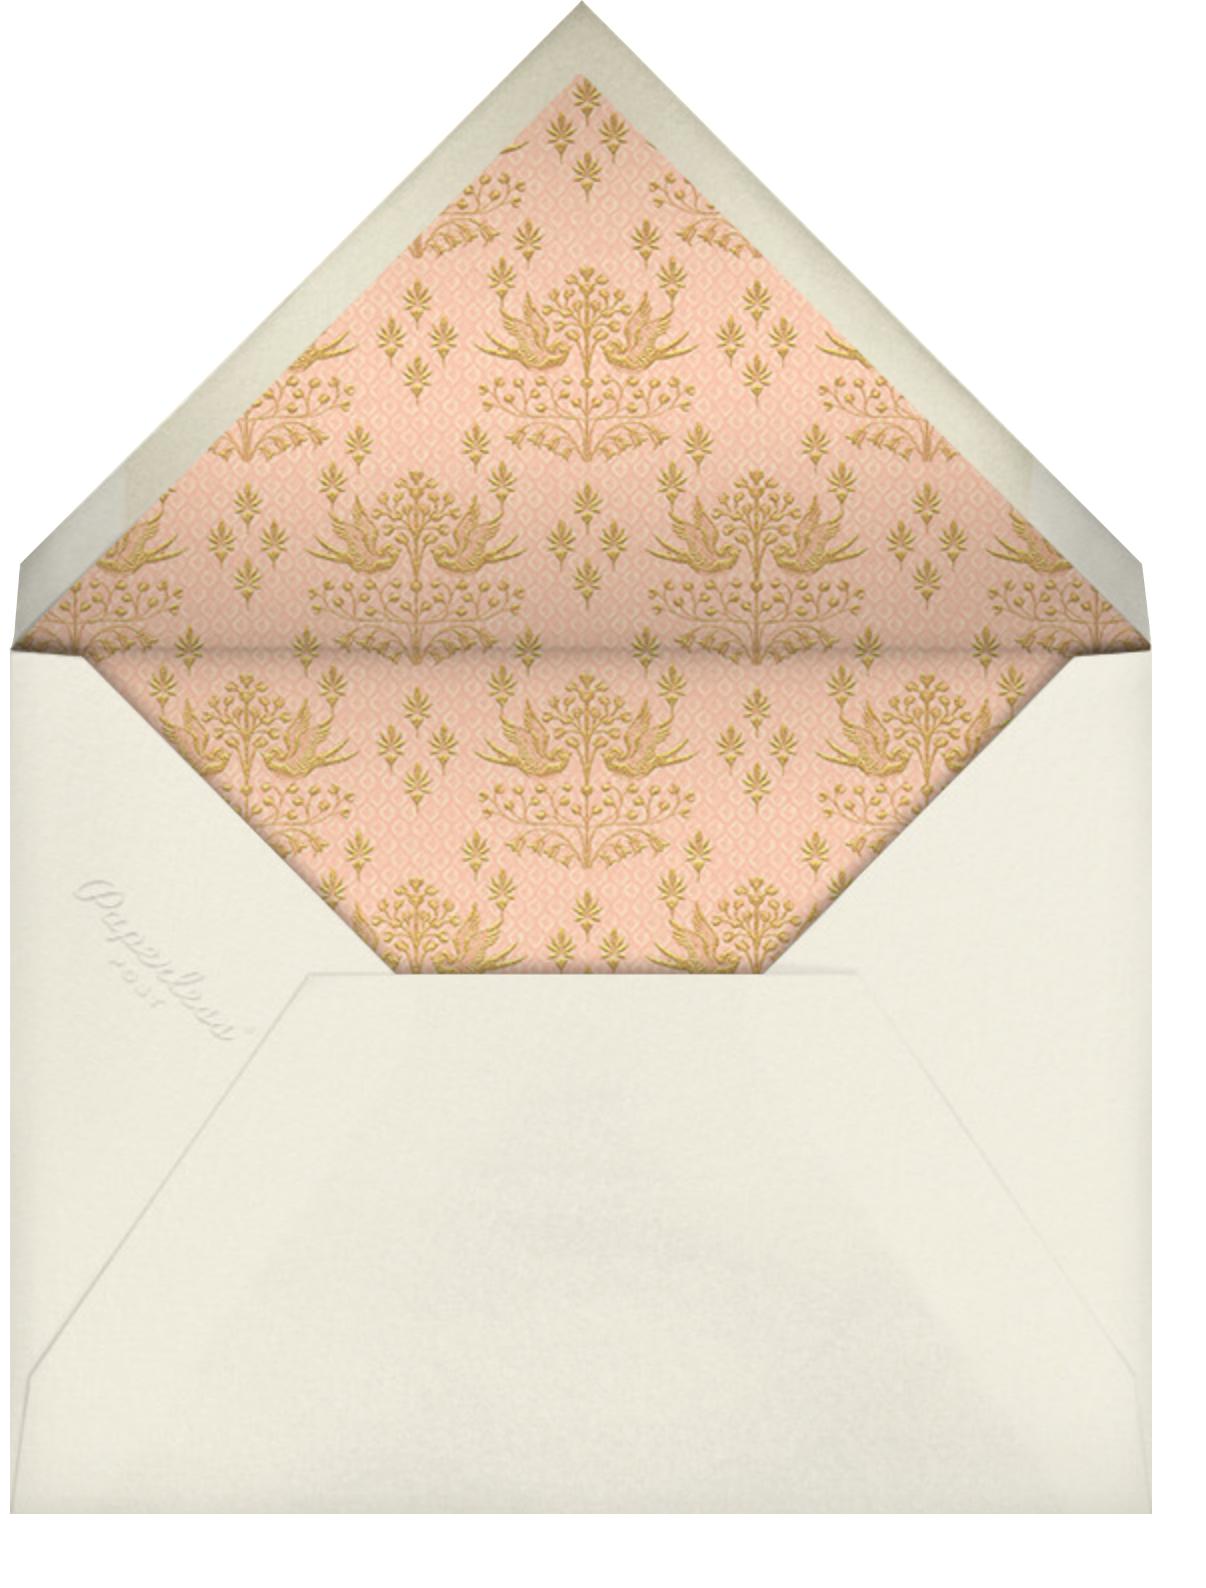 Aadya (Invitation) - Sherbet - Anita Dongre - Indian - envelope back